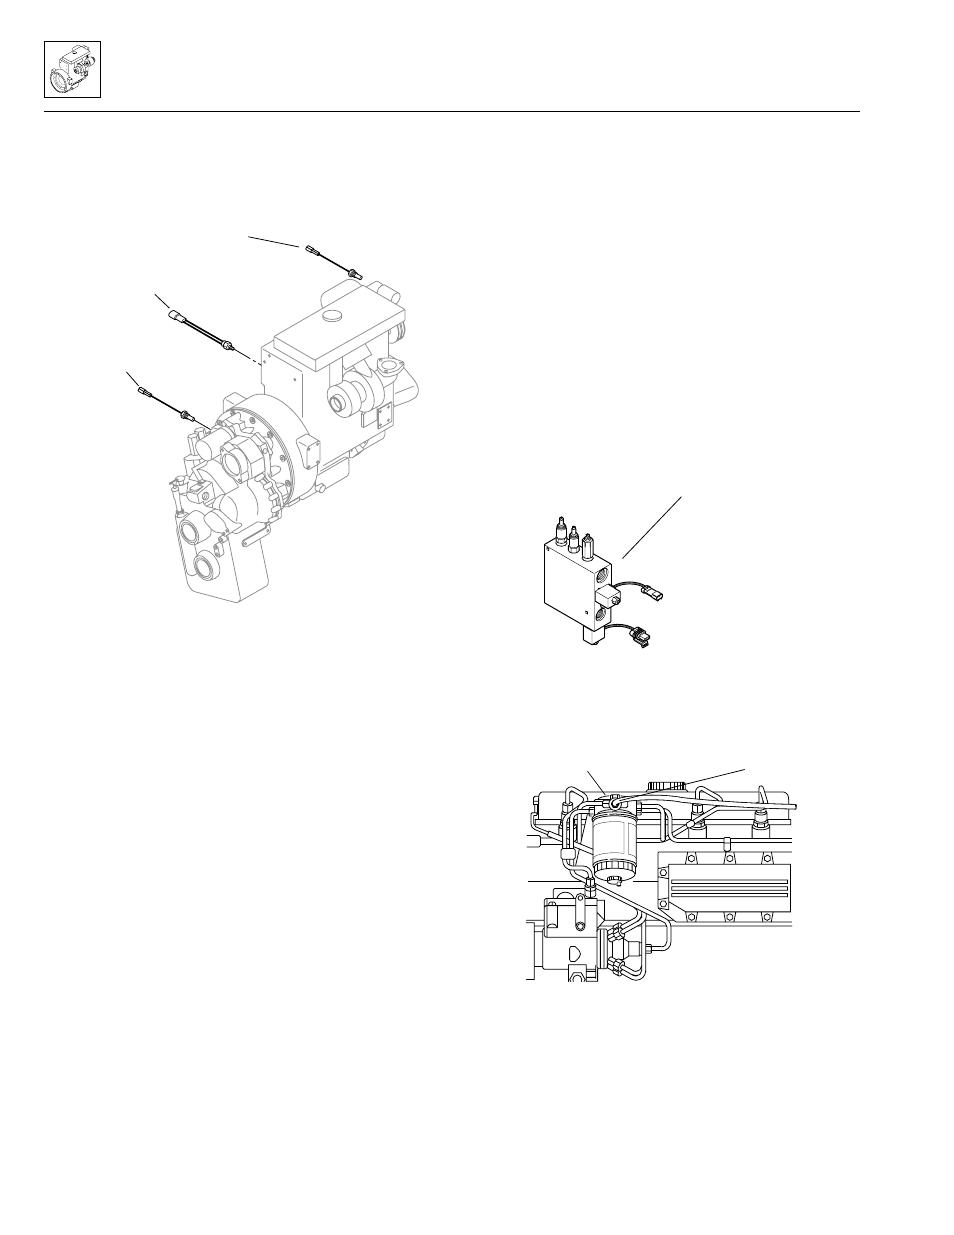 SkyTrak 3606 Service Manual User Manual   Page 164 / 412